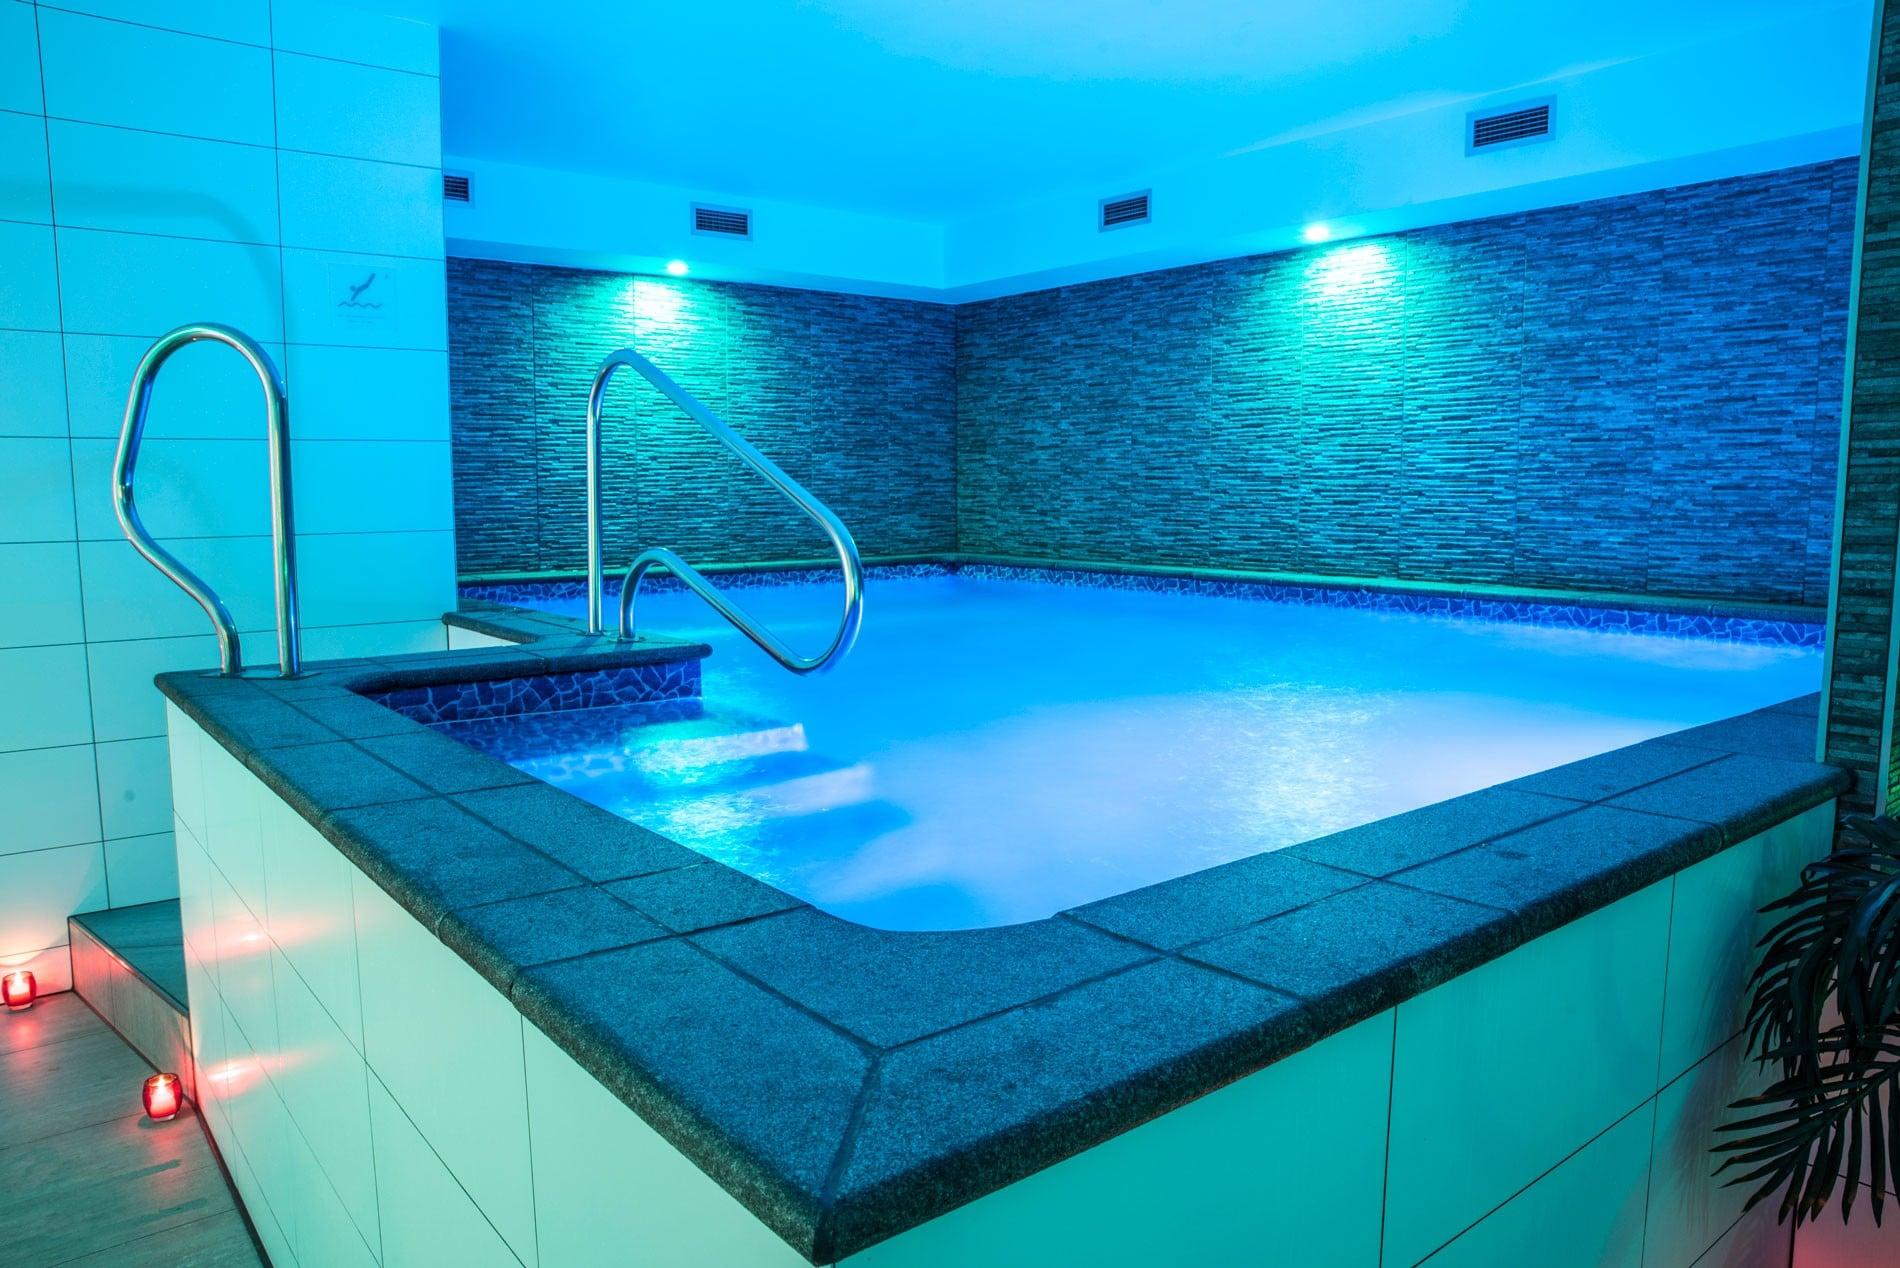 Prive Sauna Zwembad.Faciliteiten Zaanstad Prive Sauna Spa En Wellness Relax Center